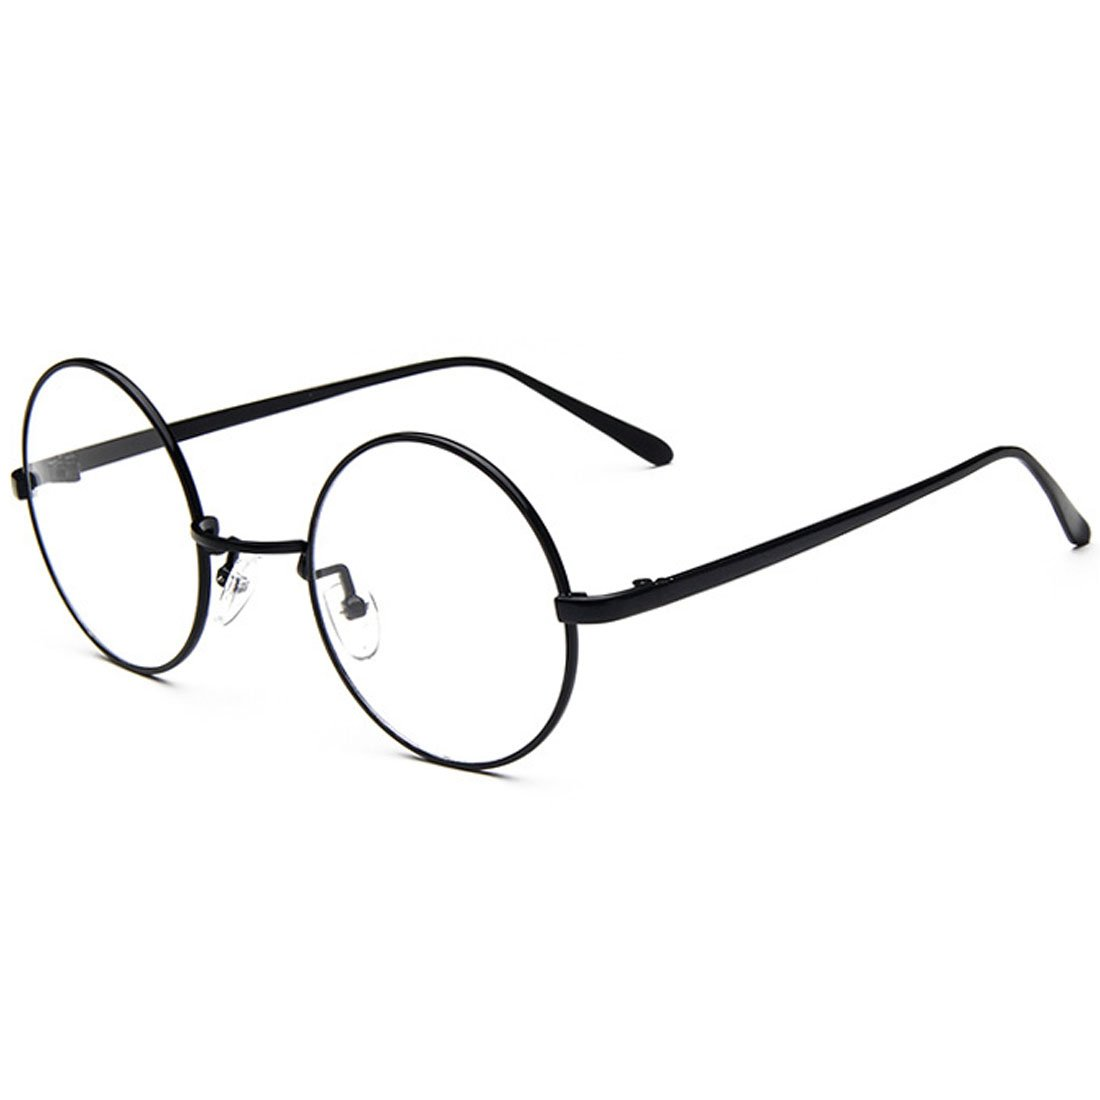 89df24c1cc0 Amazon.com  D.King Oversized Vintage Round Retro Large Metal Frame Clear  Lens Eyeglasses Black  Clothing